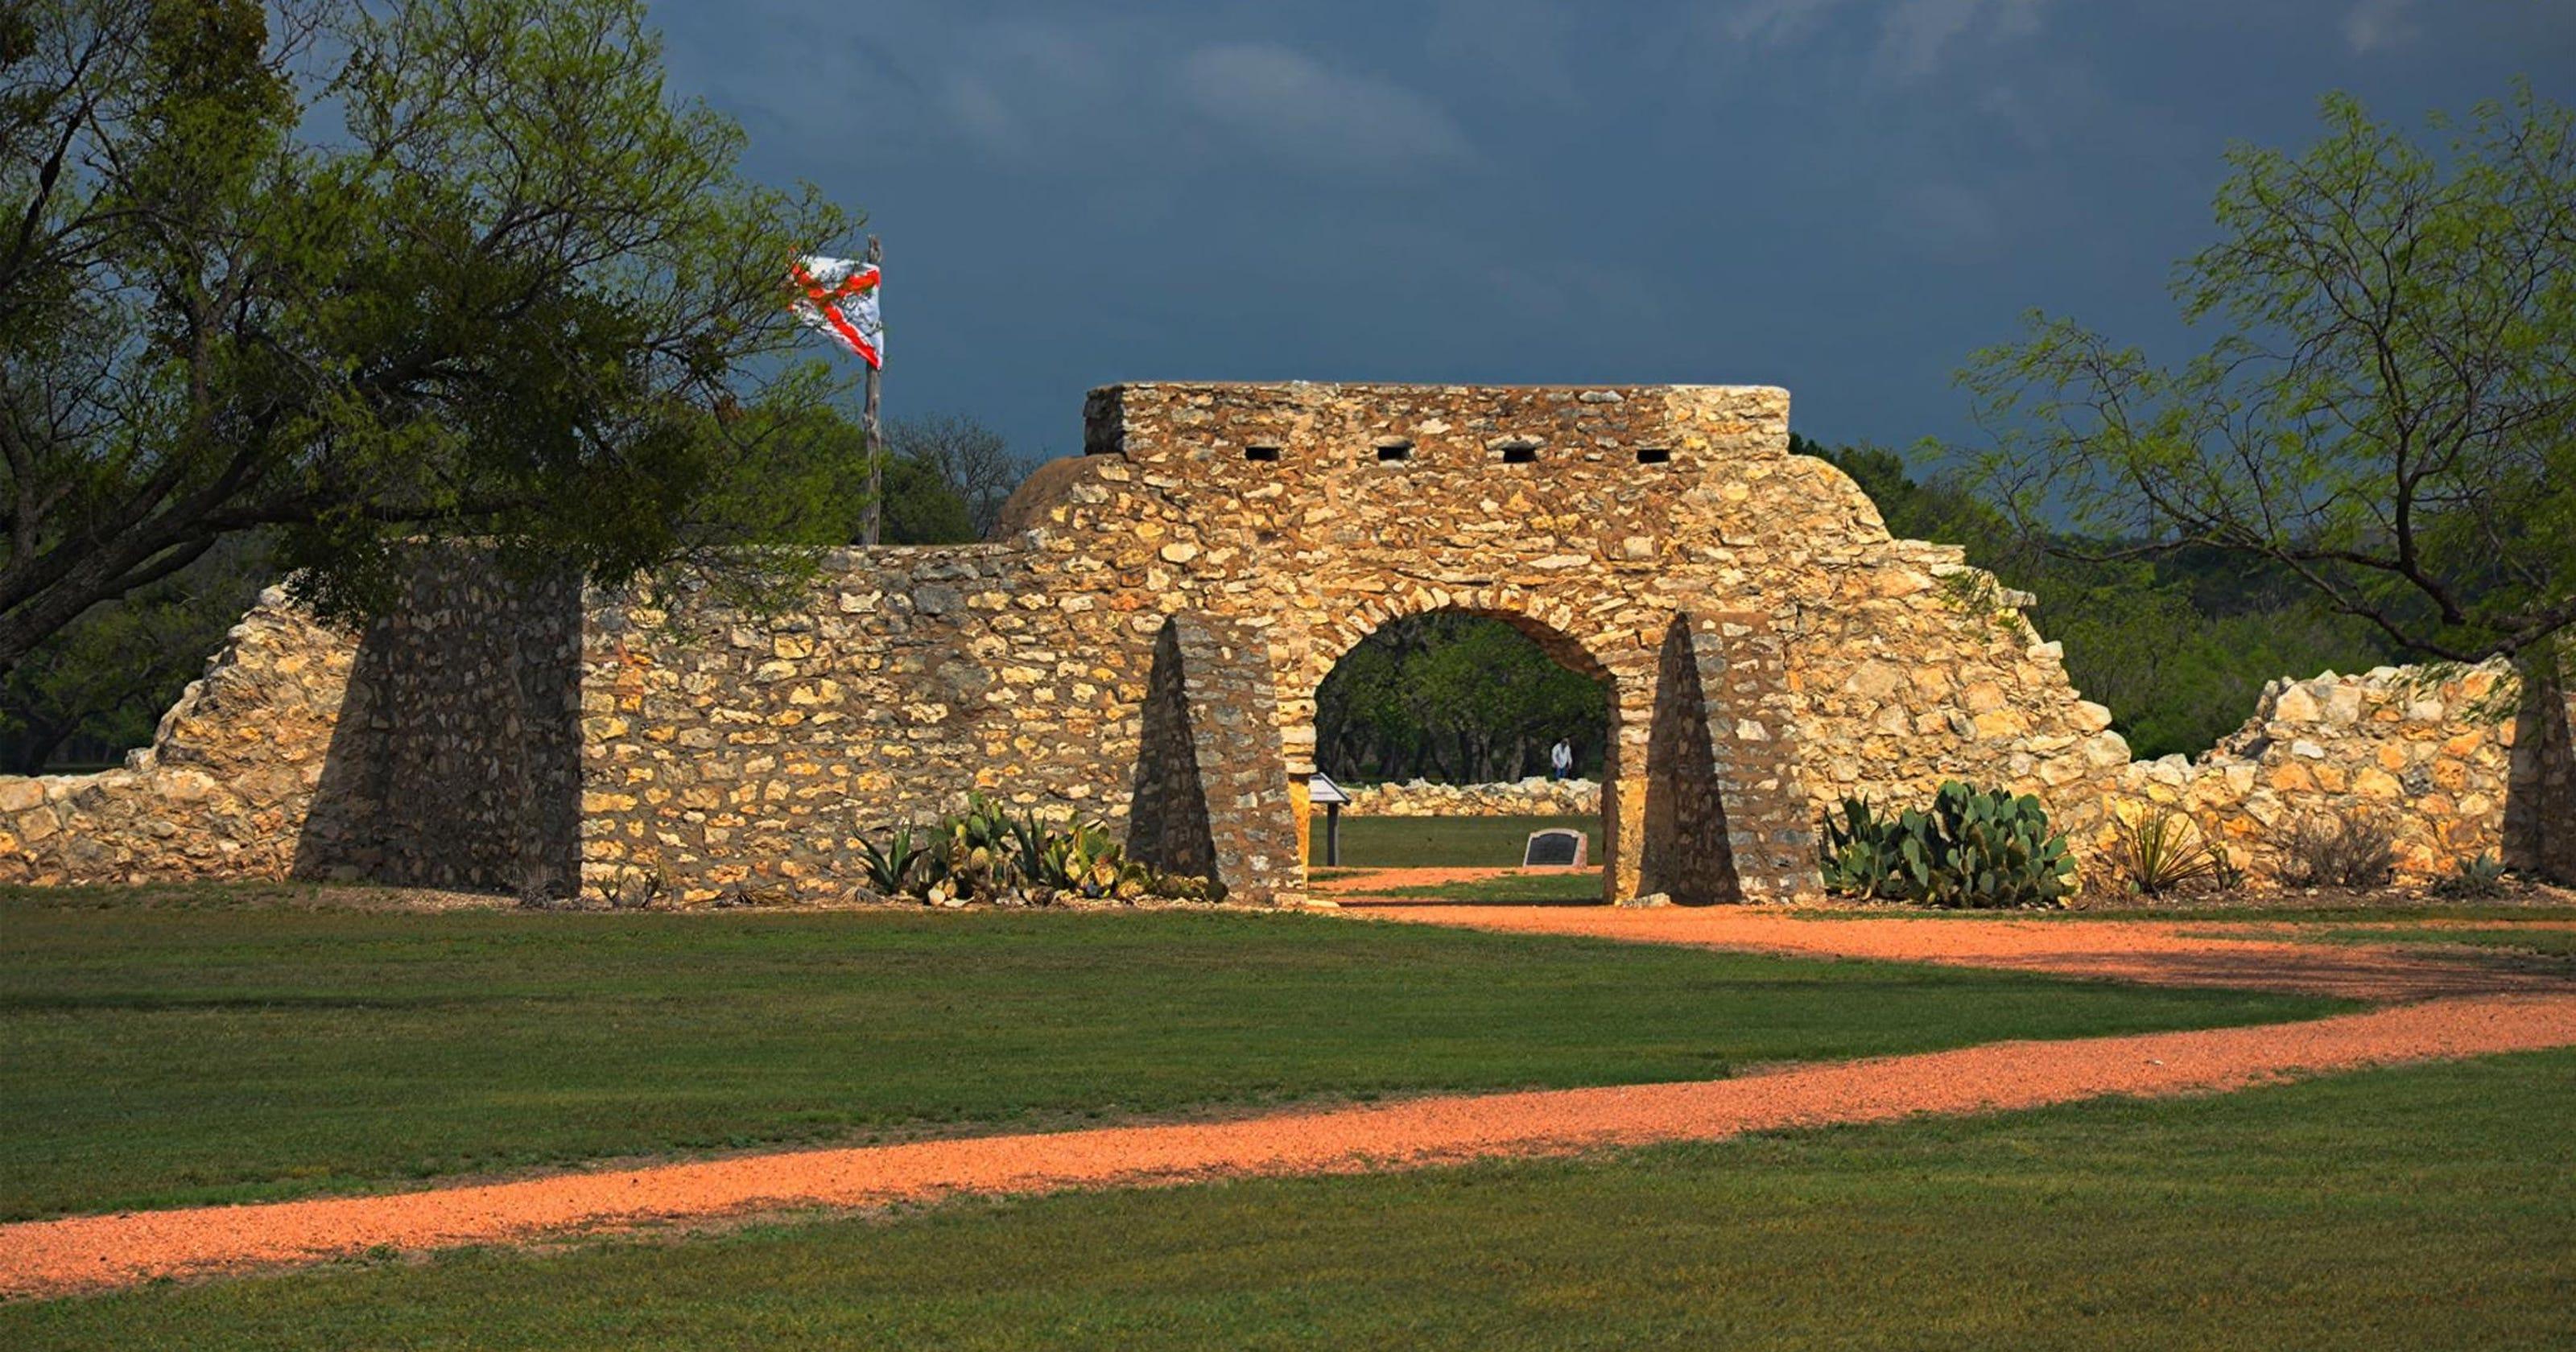 Not \'just a pile of rocks\': Funds sought to restore Presidio de San Saba